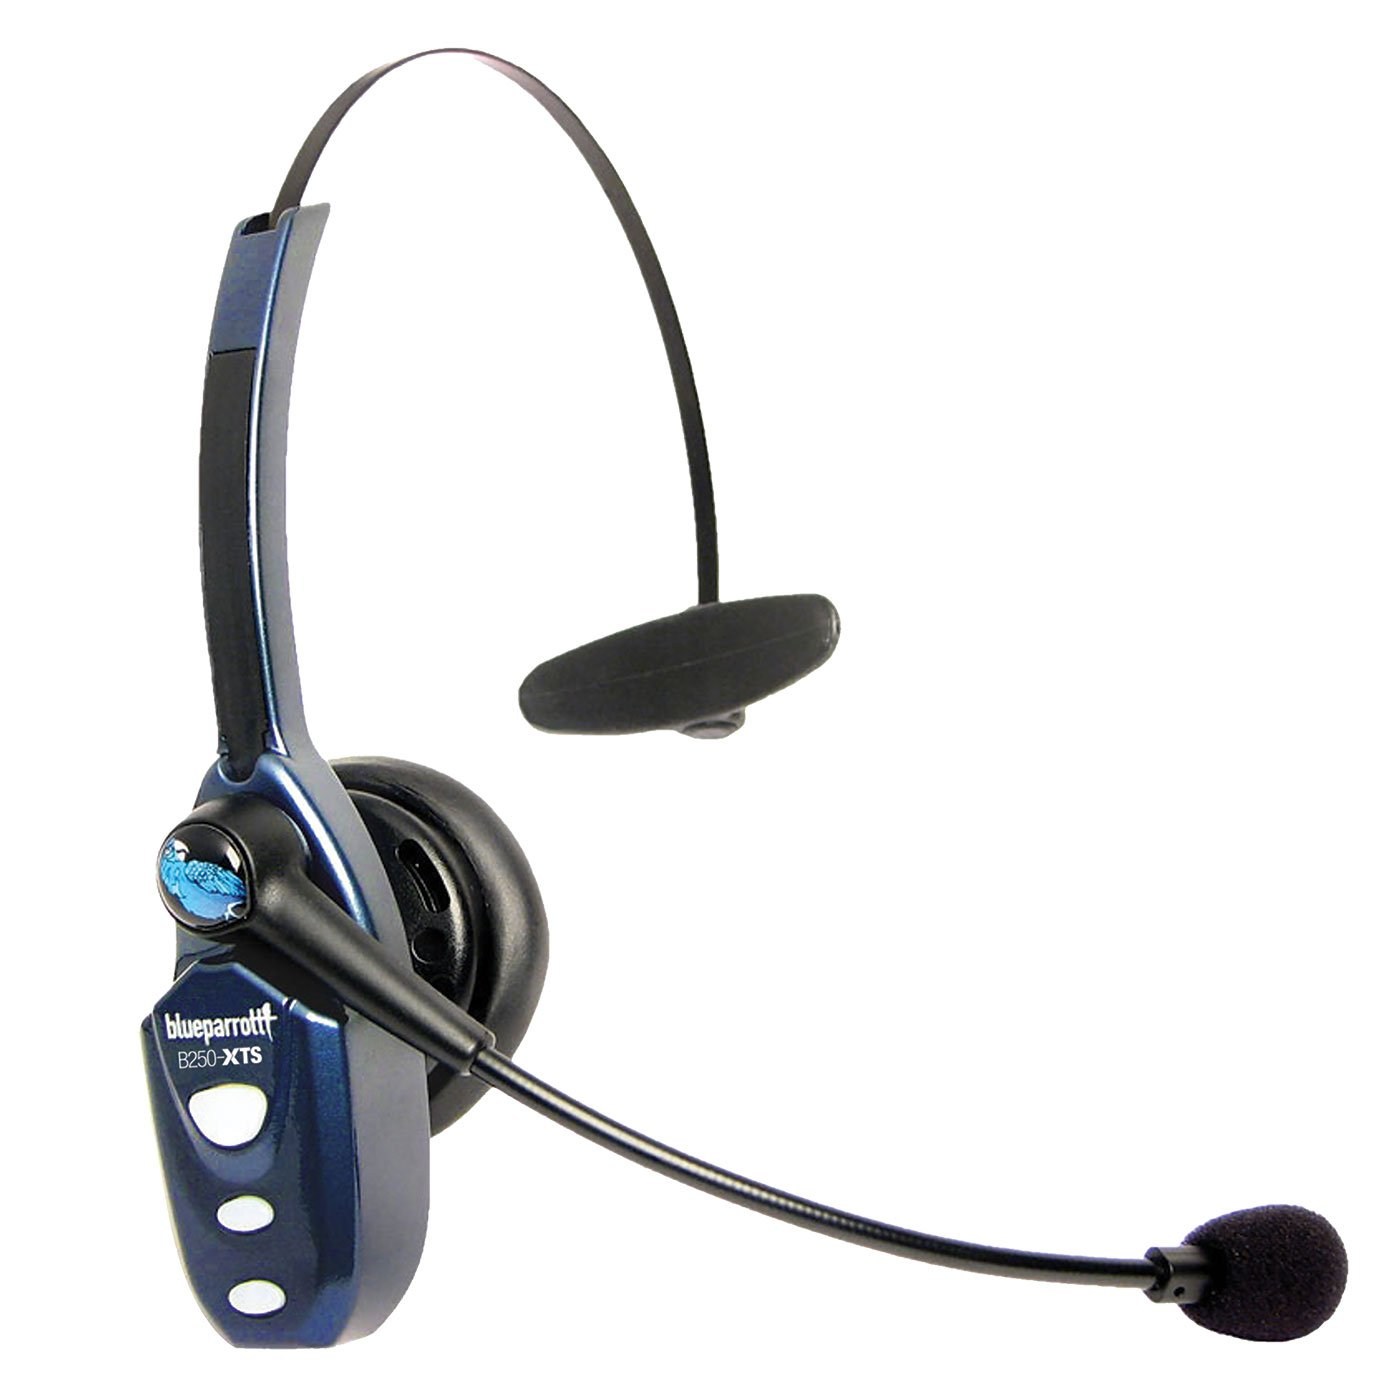 BlueParrott Bluetooth Headset with Micro USB Charging (B250-XTS)